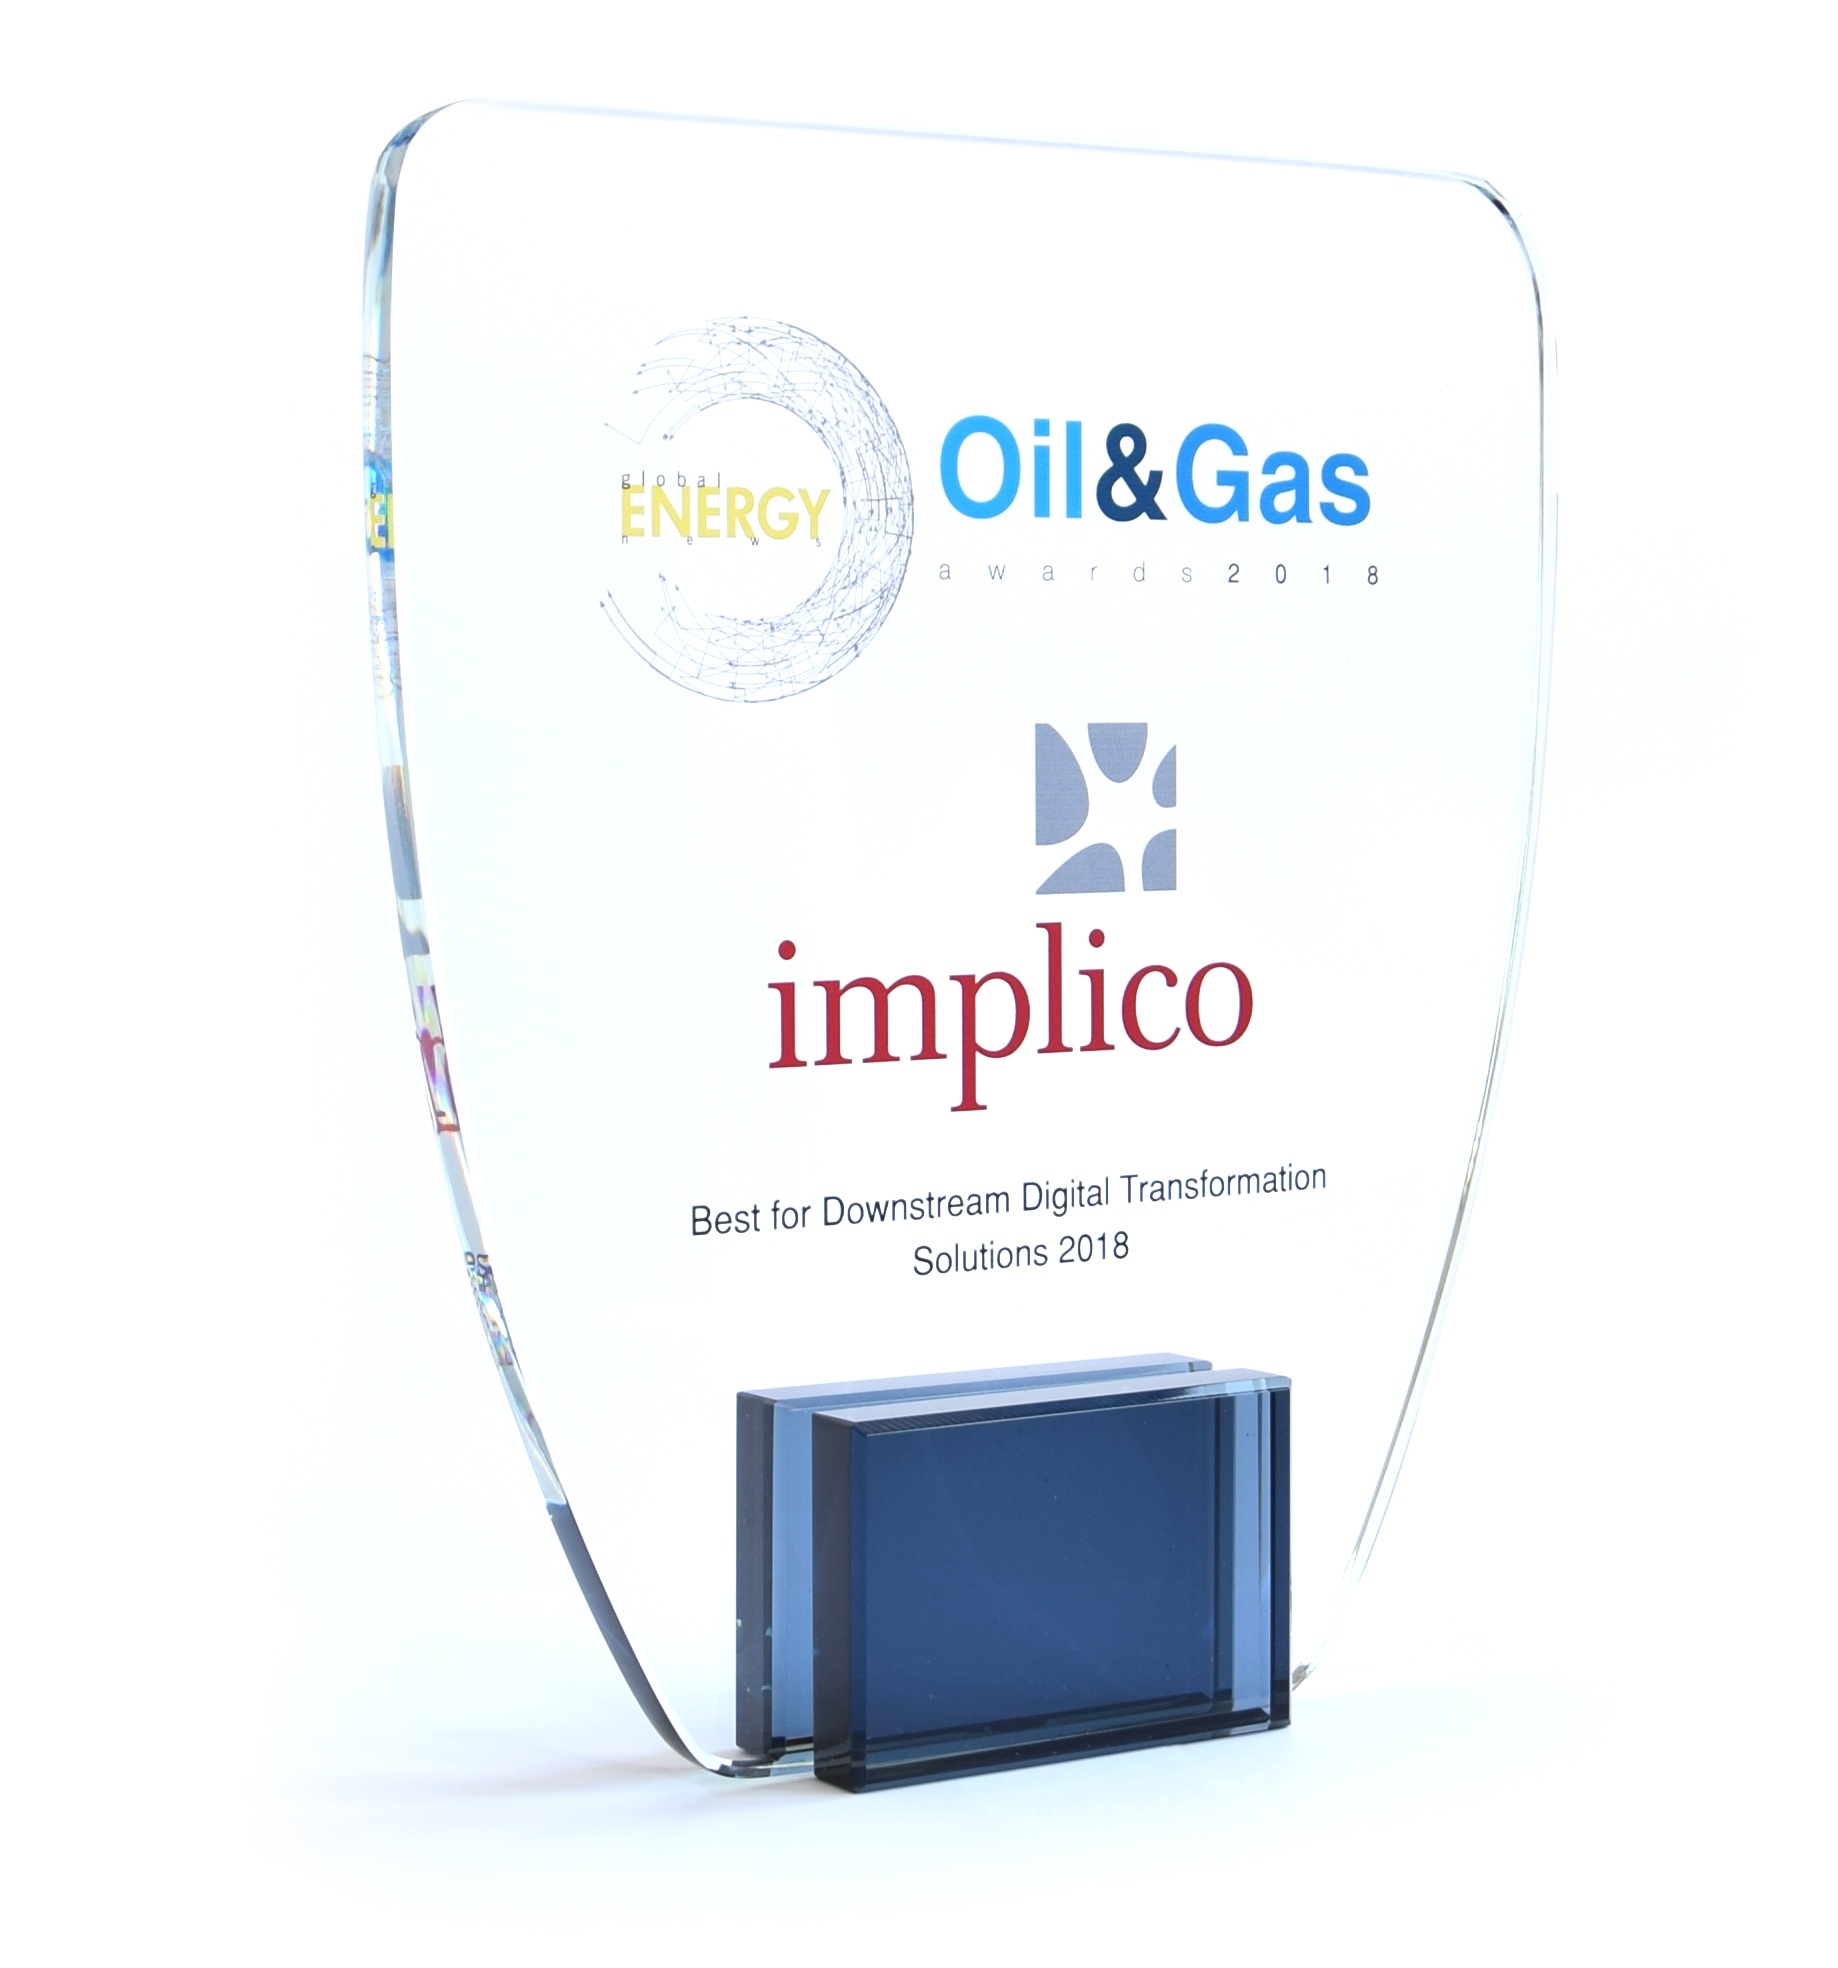 Digitale Transformation: Implico erhält Oil & Gas Award 2018 - Featured Image